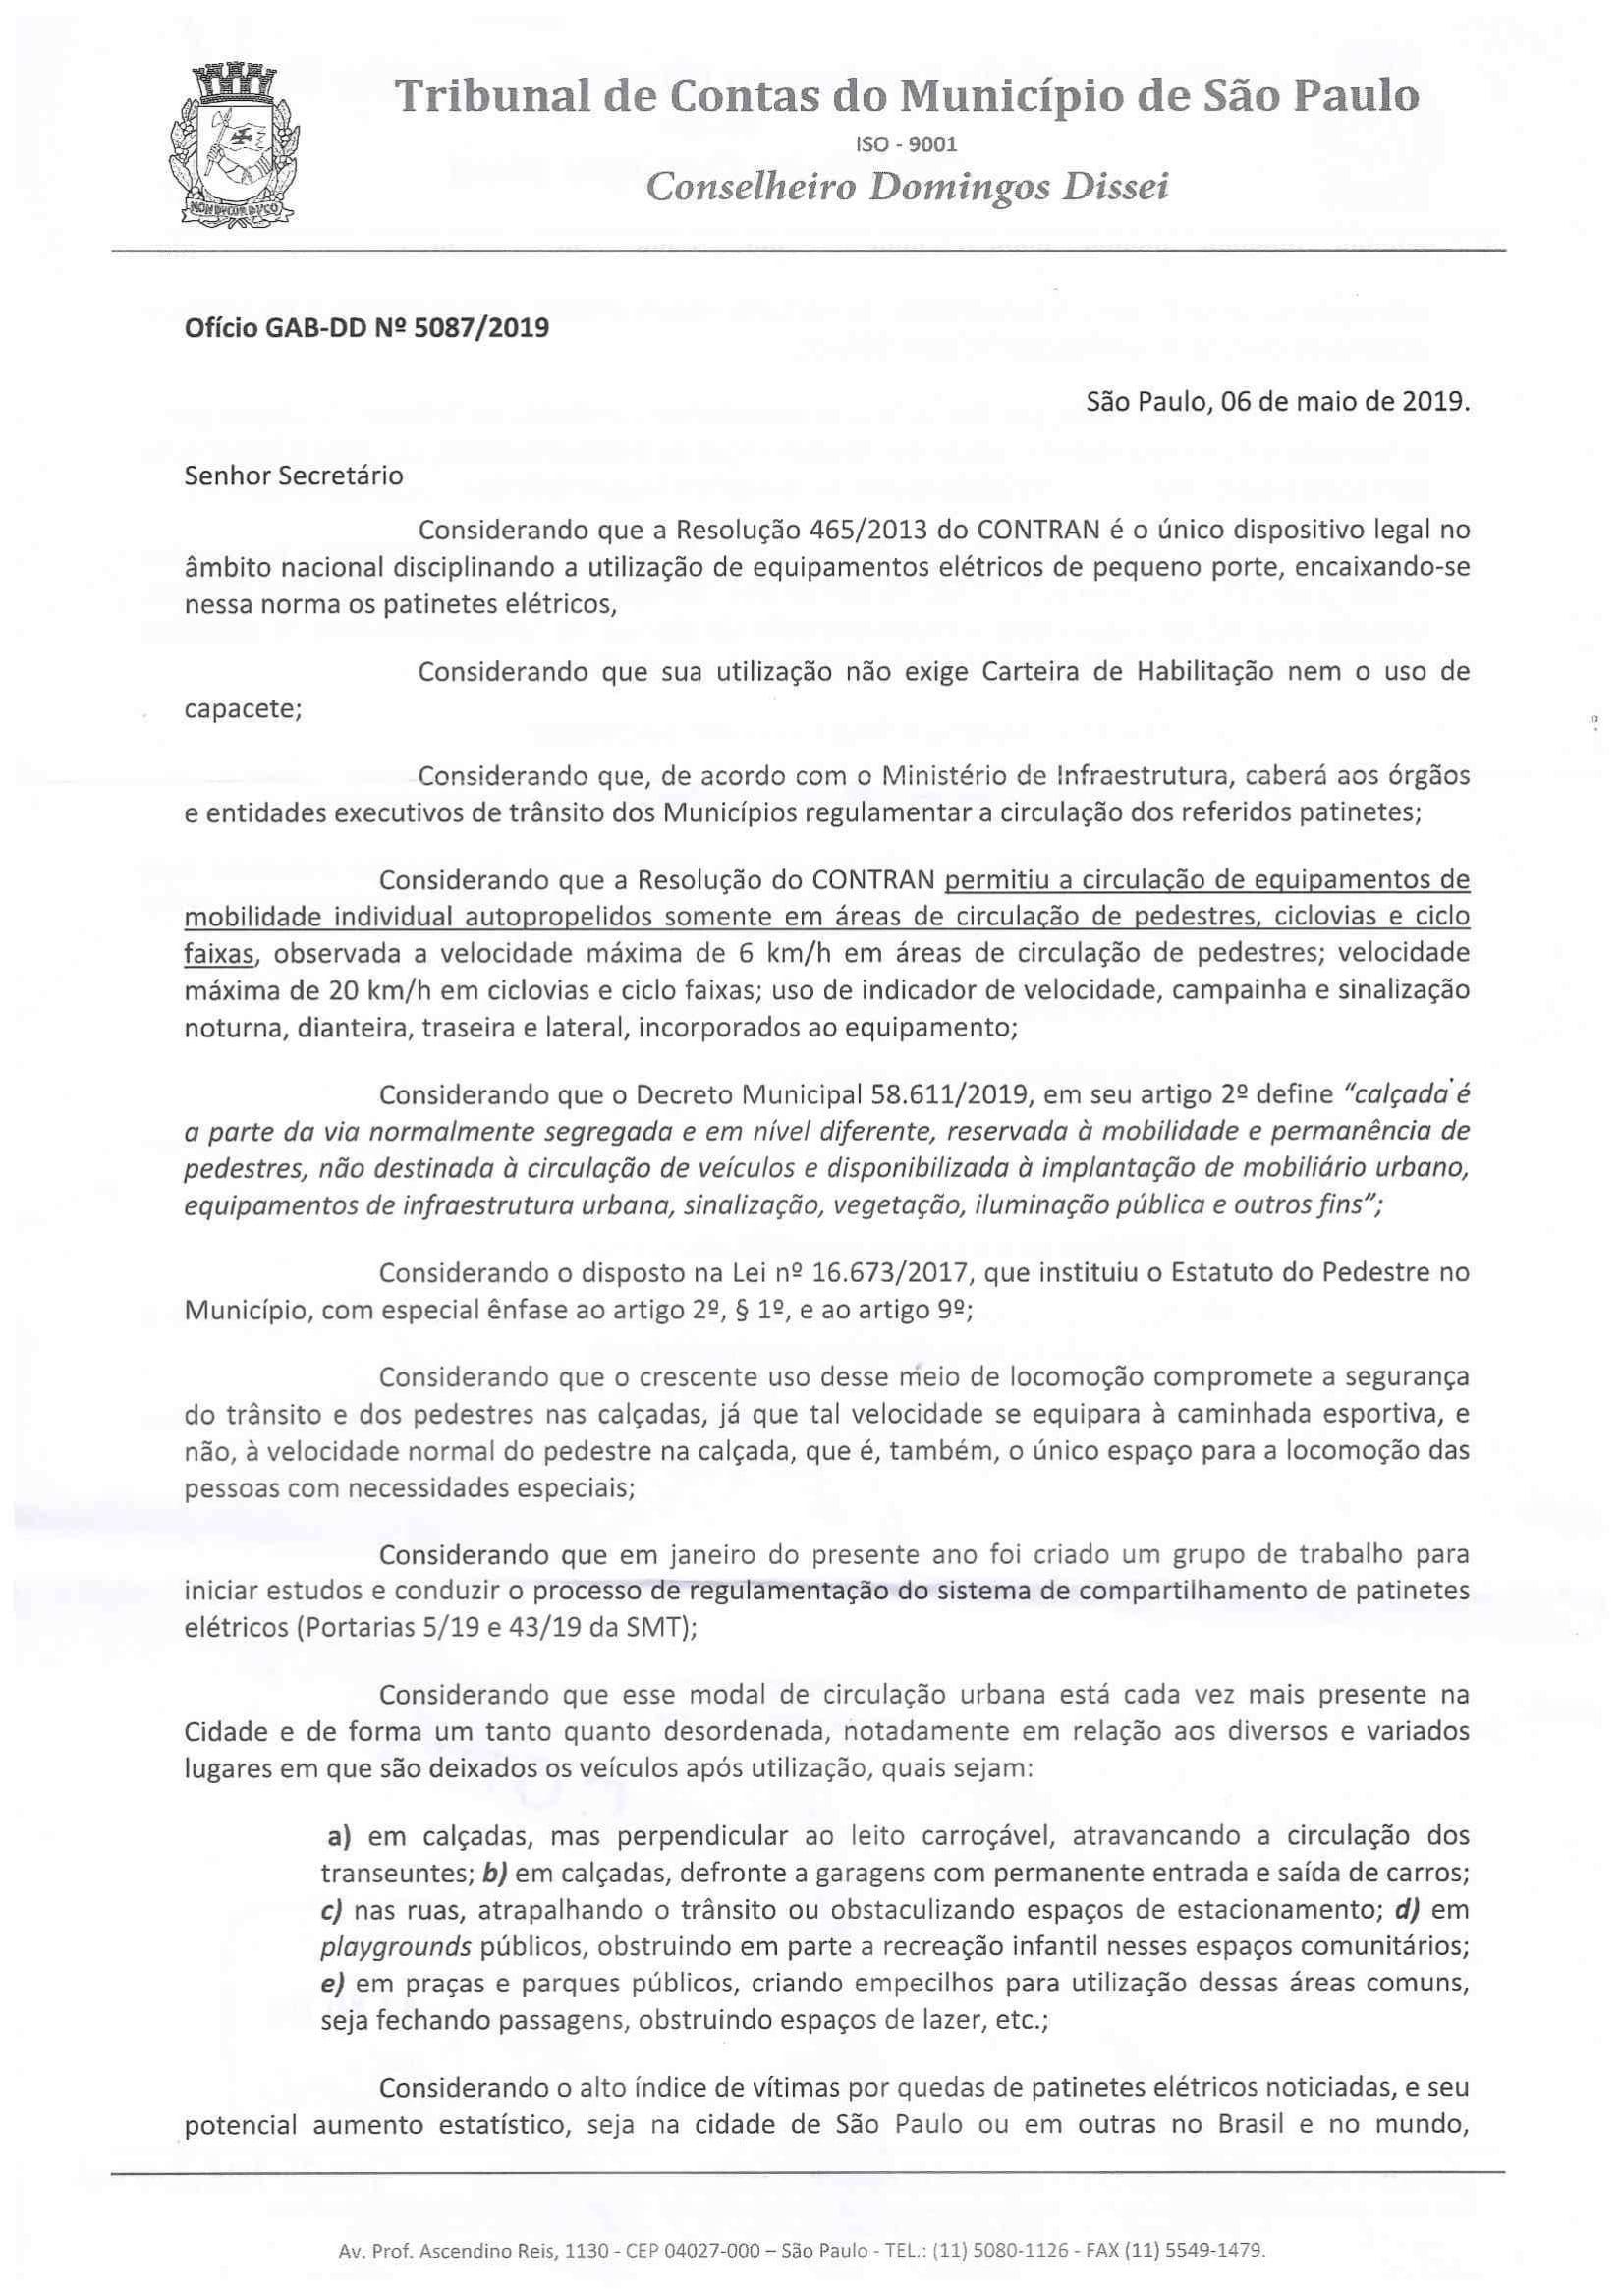 Of GAB DD 5087 2019 Protocolado-1